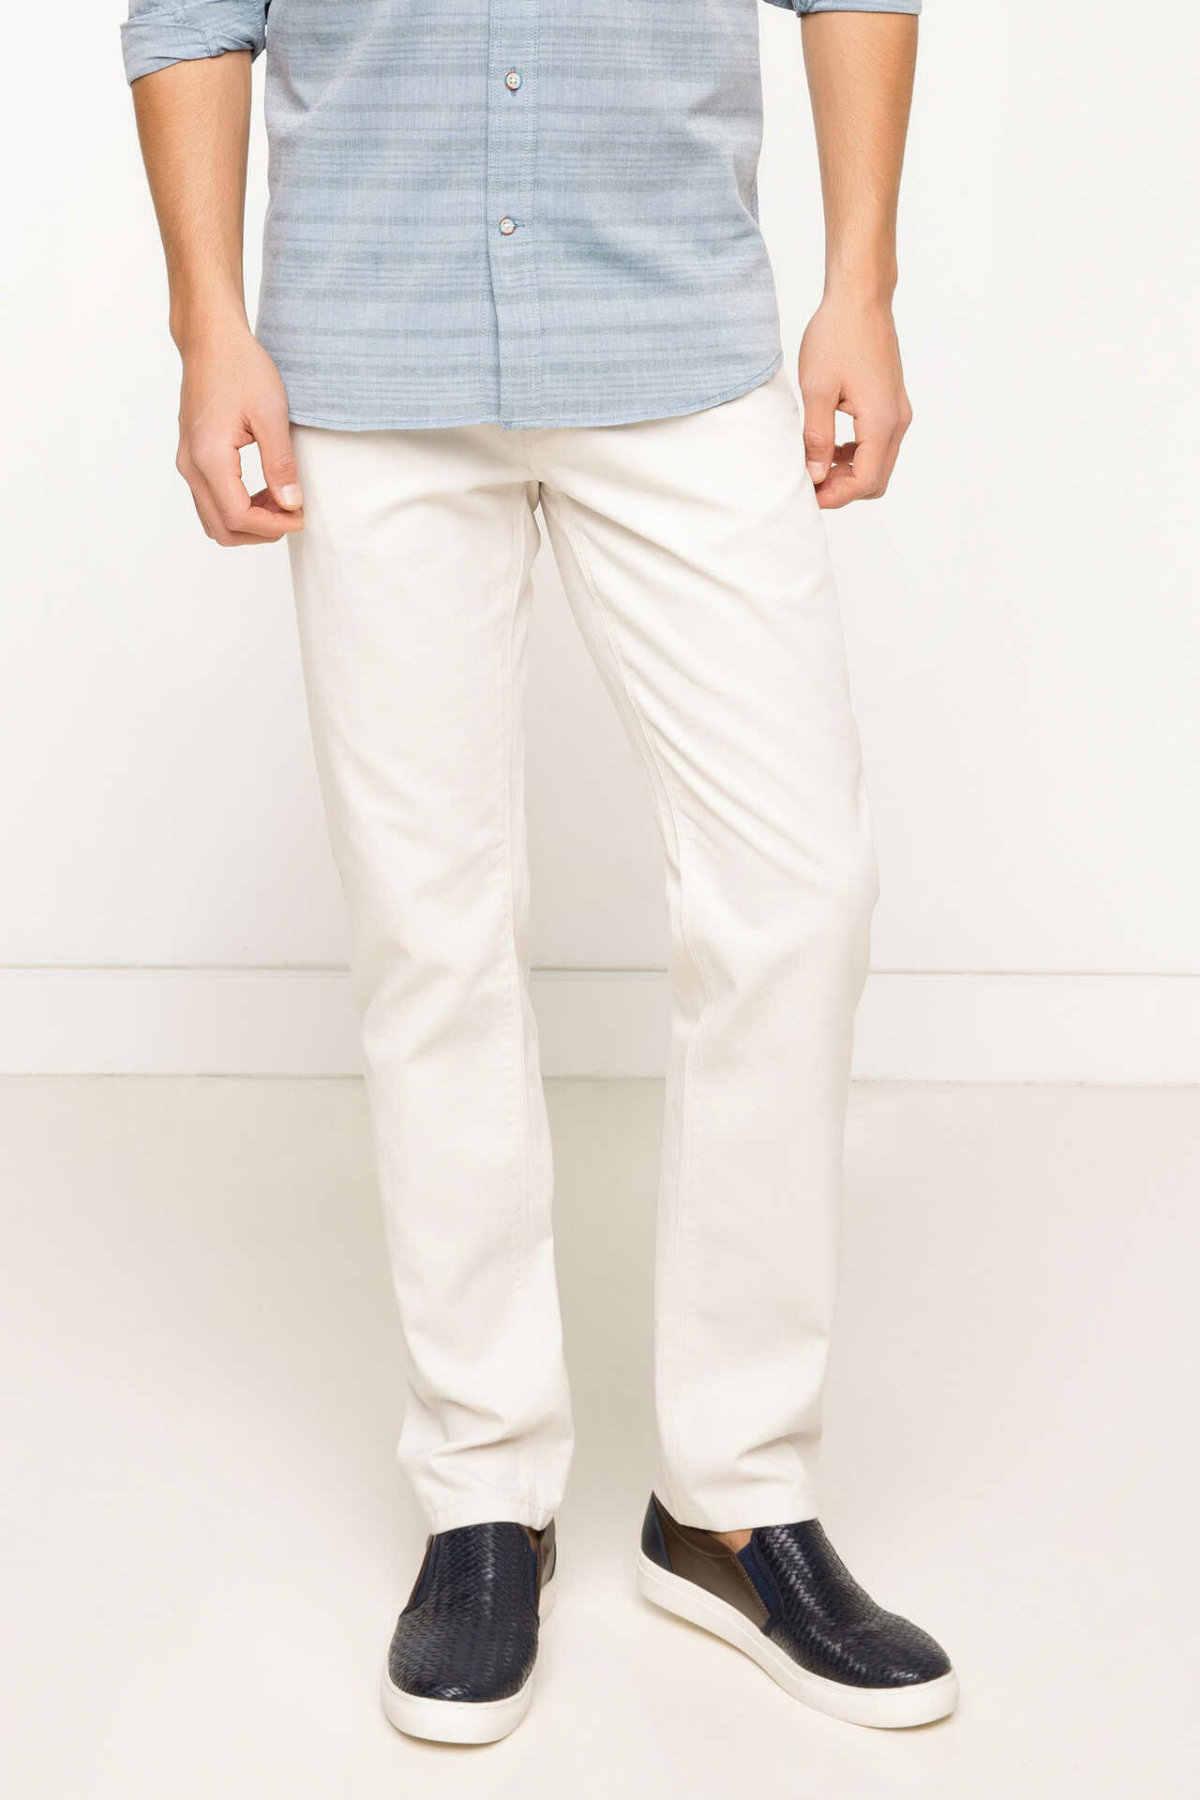 Defacto Man Witte Lange Broek Mannen Lente Cargo Broek Man Mid Taille Bodems Mannen Slim Fit Body Trousers-G6025AZ17SP